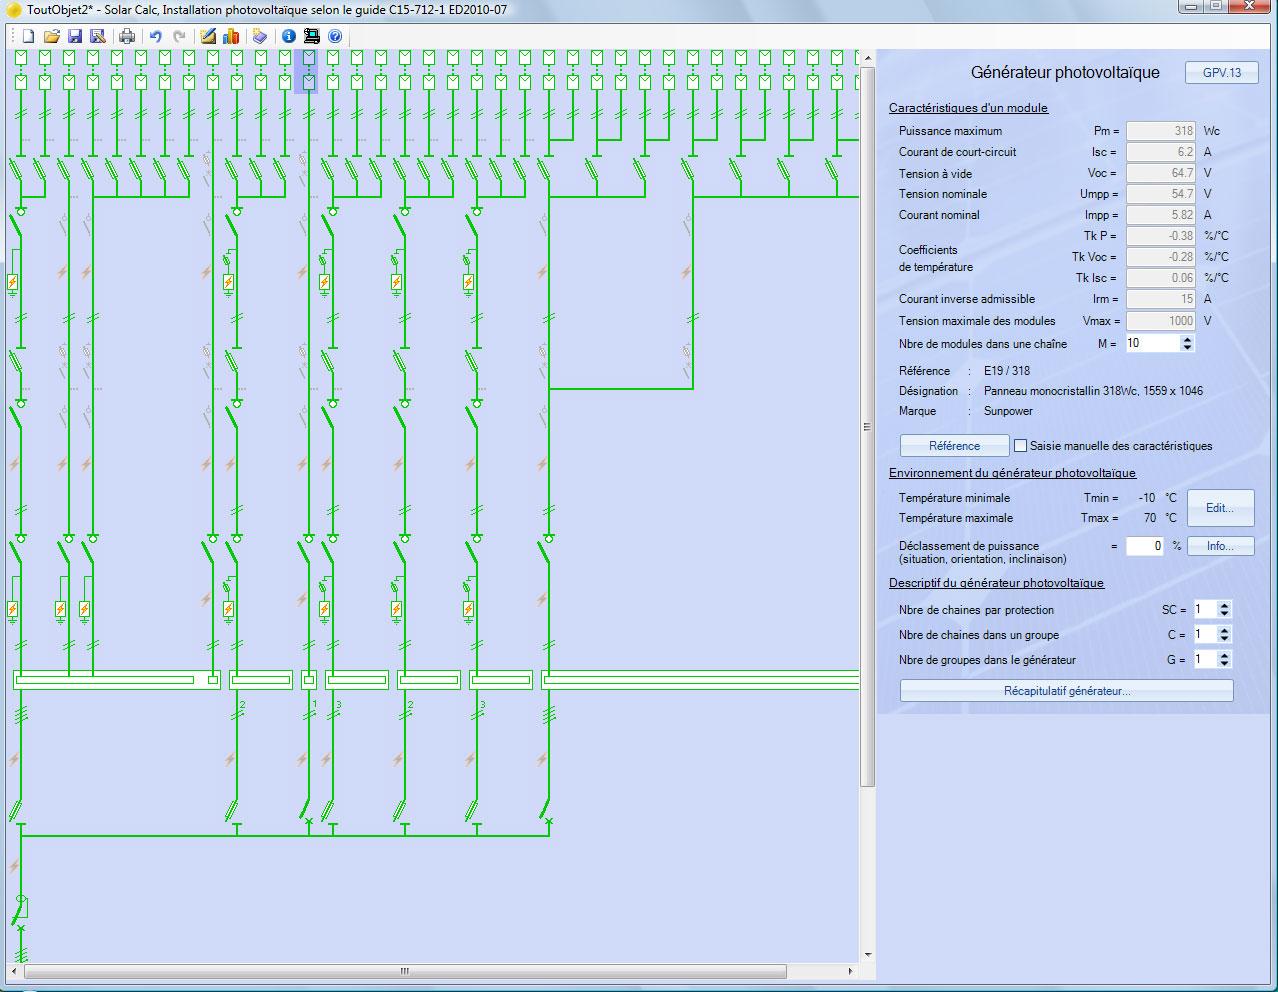 generateur-photovoltaique